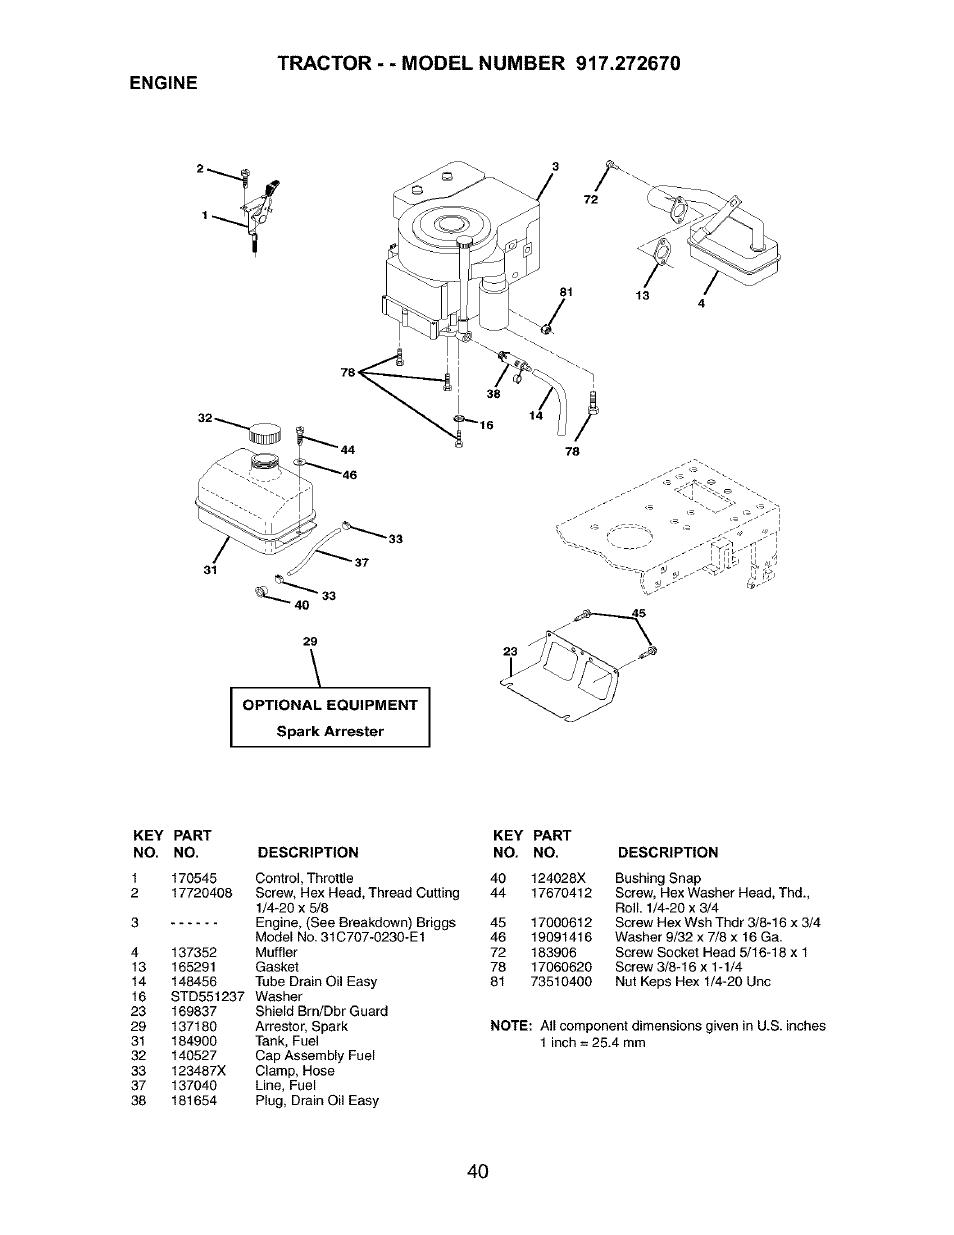 Manual for 31c707 array craftsman 917 272670 user manual page 40 56 rh manualsdir fandeluxe Gallery